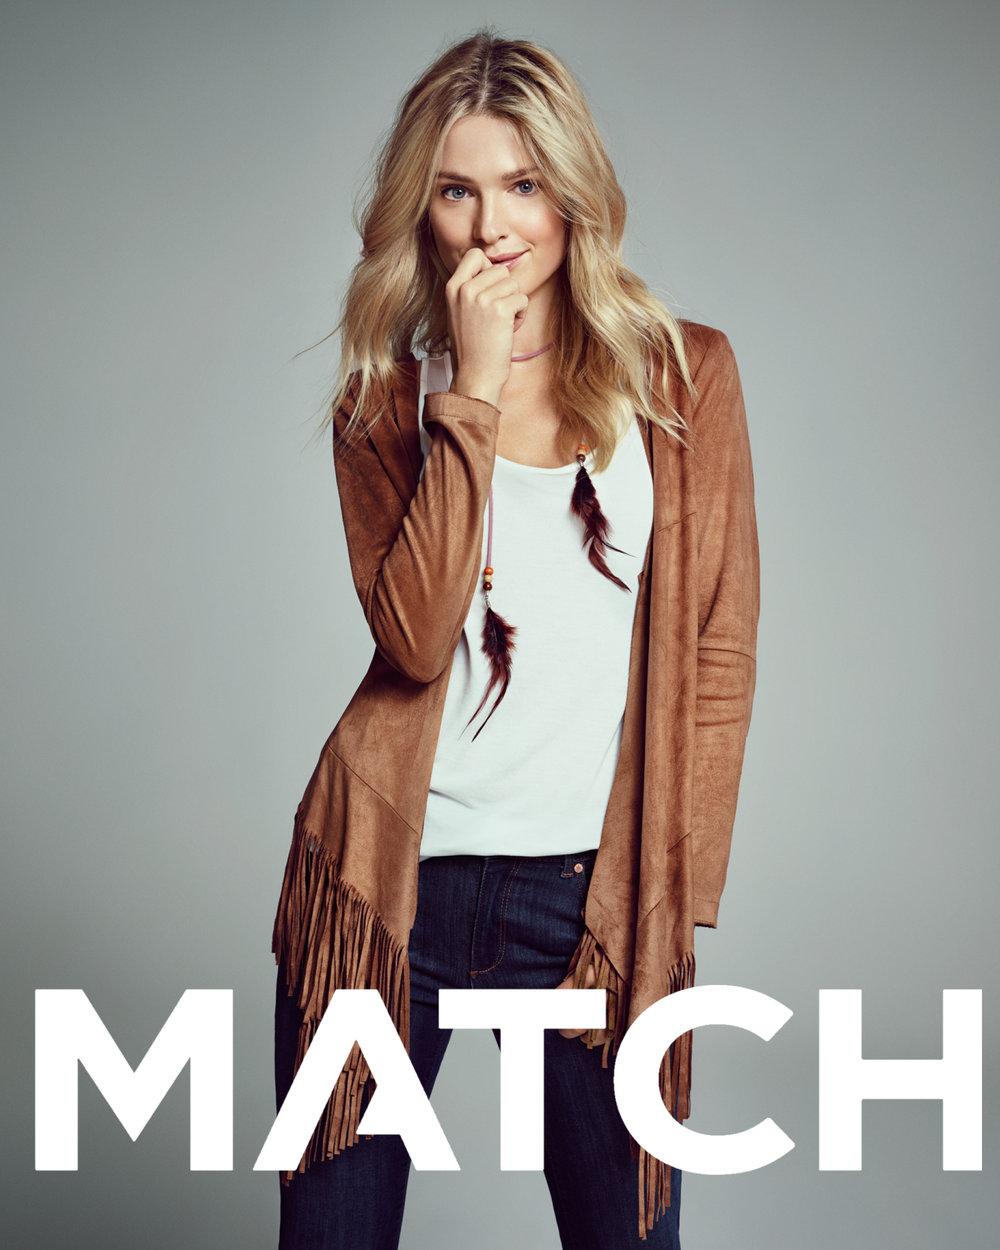 match114.jpg